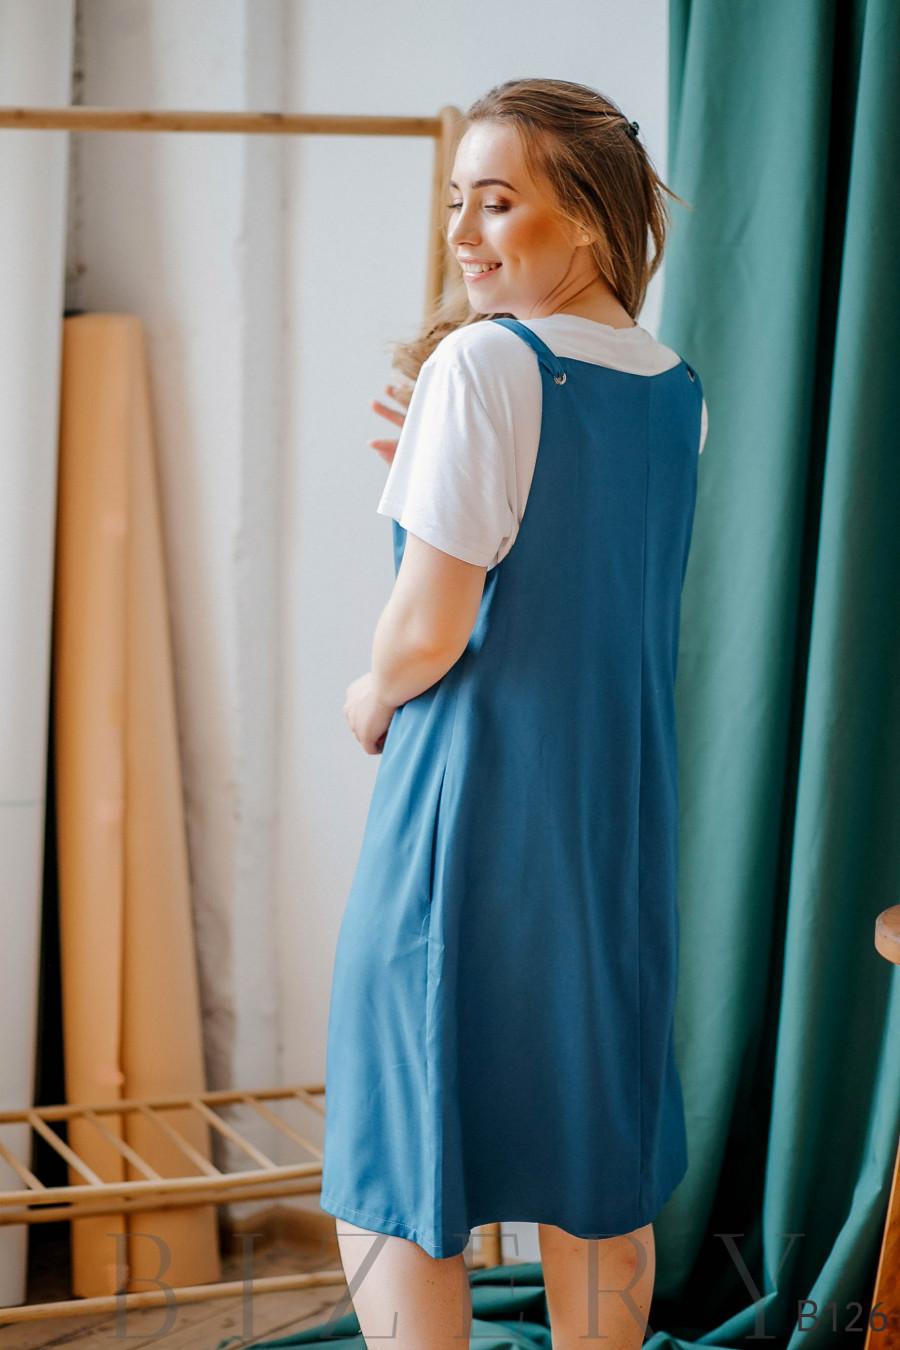 Сарафан голубой свободного кроя на завязках + мягкая белая футболка